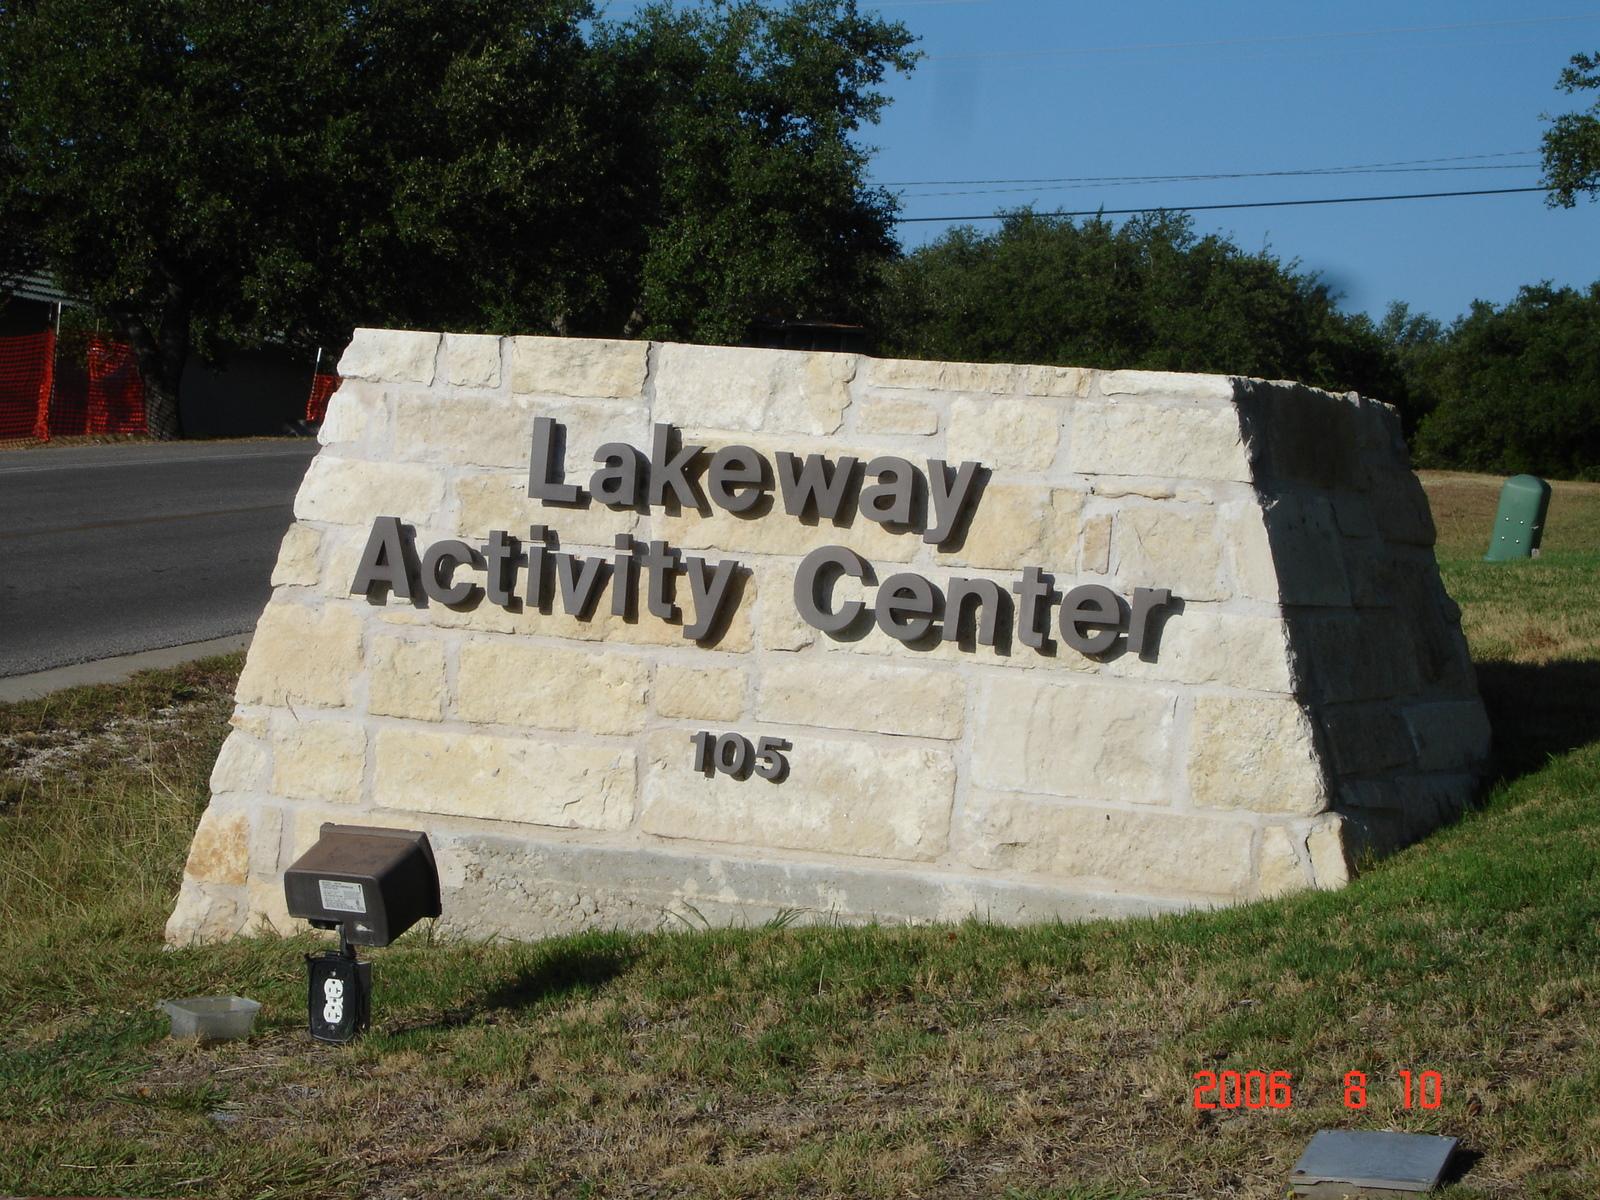 Lakeway Activity Center Metal Letter